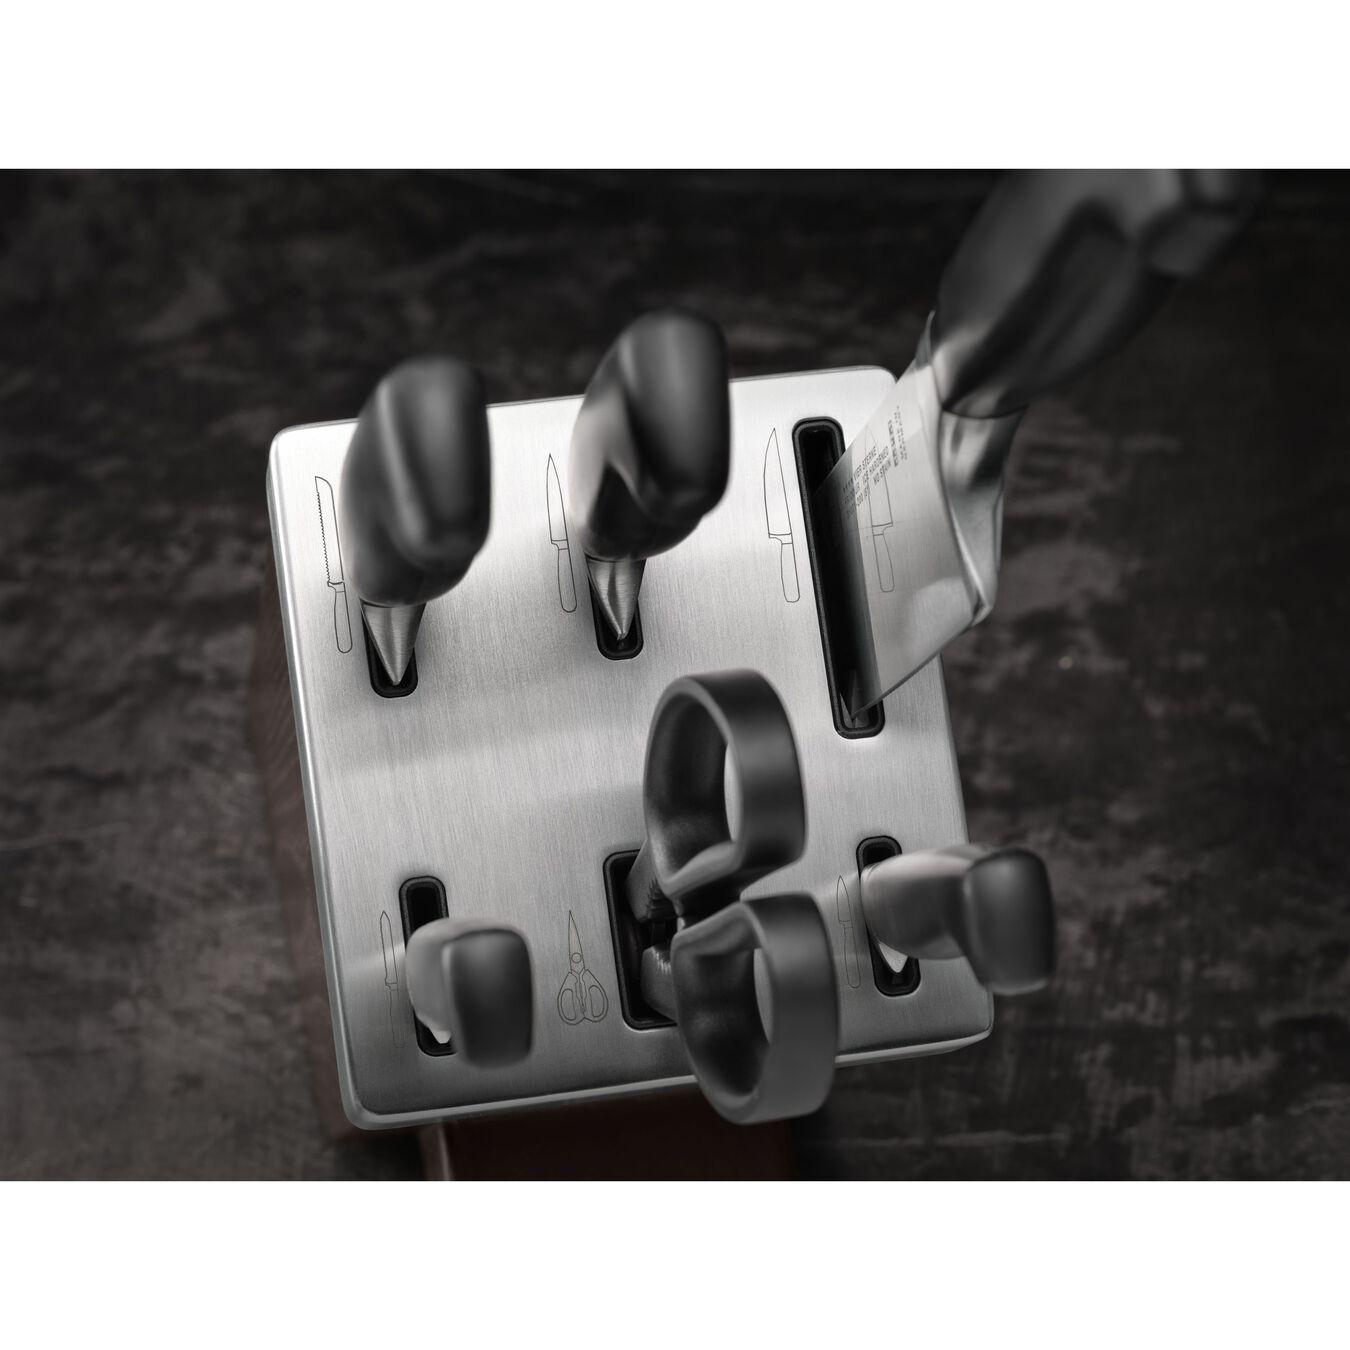 Selbstschärfender Messerblock 7-tlg, Grau,,large 2